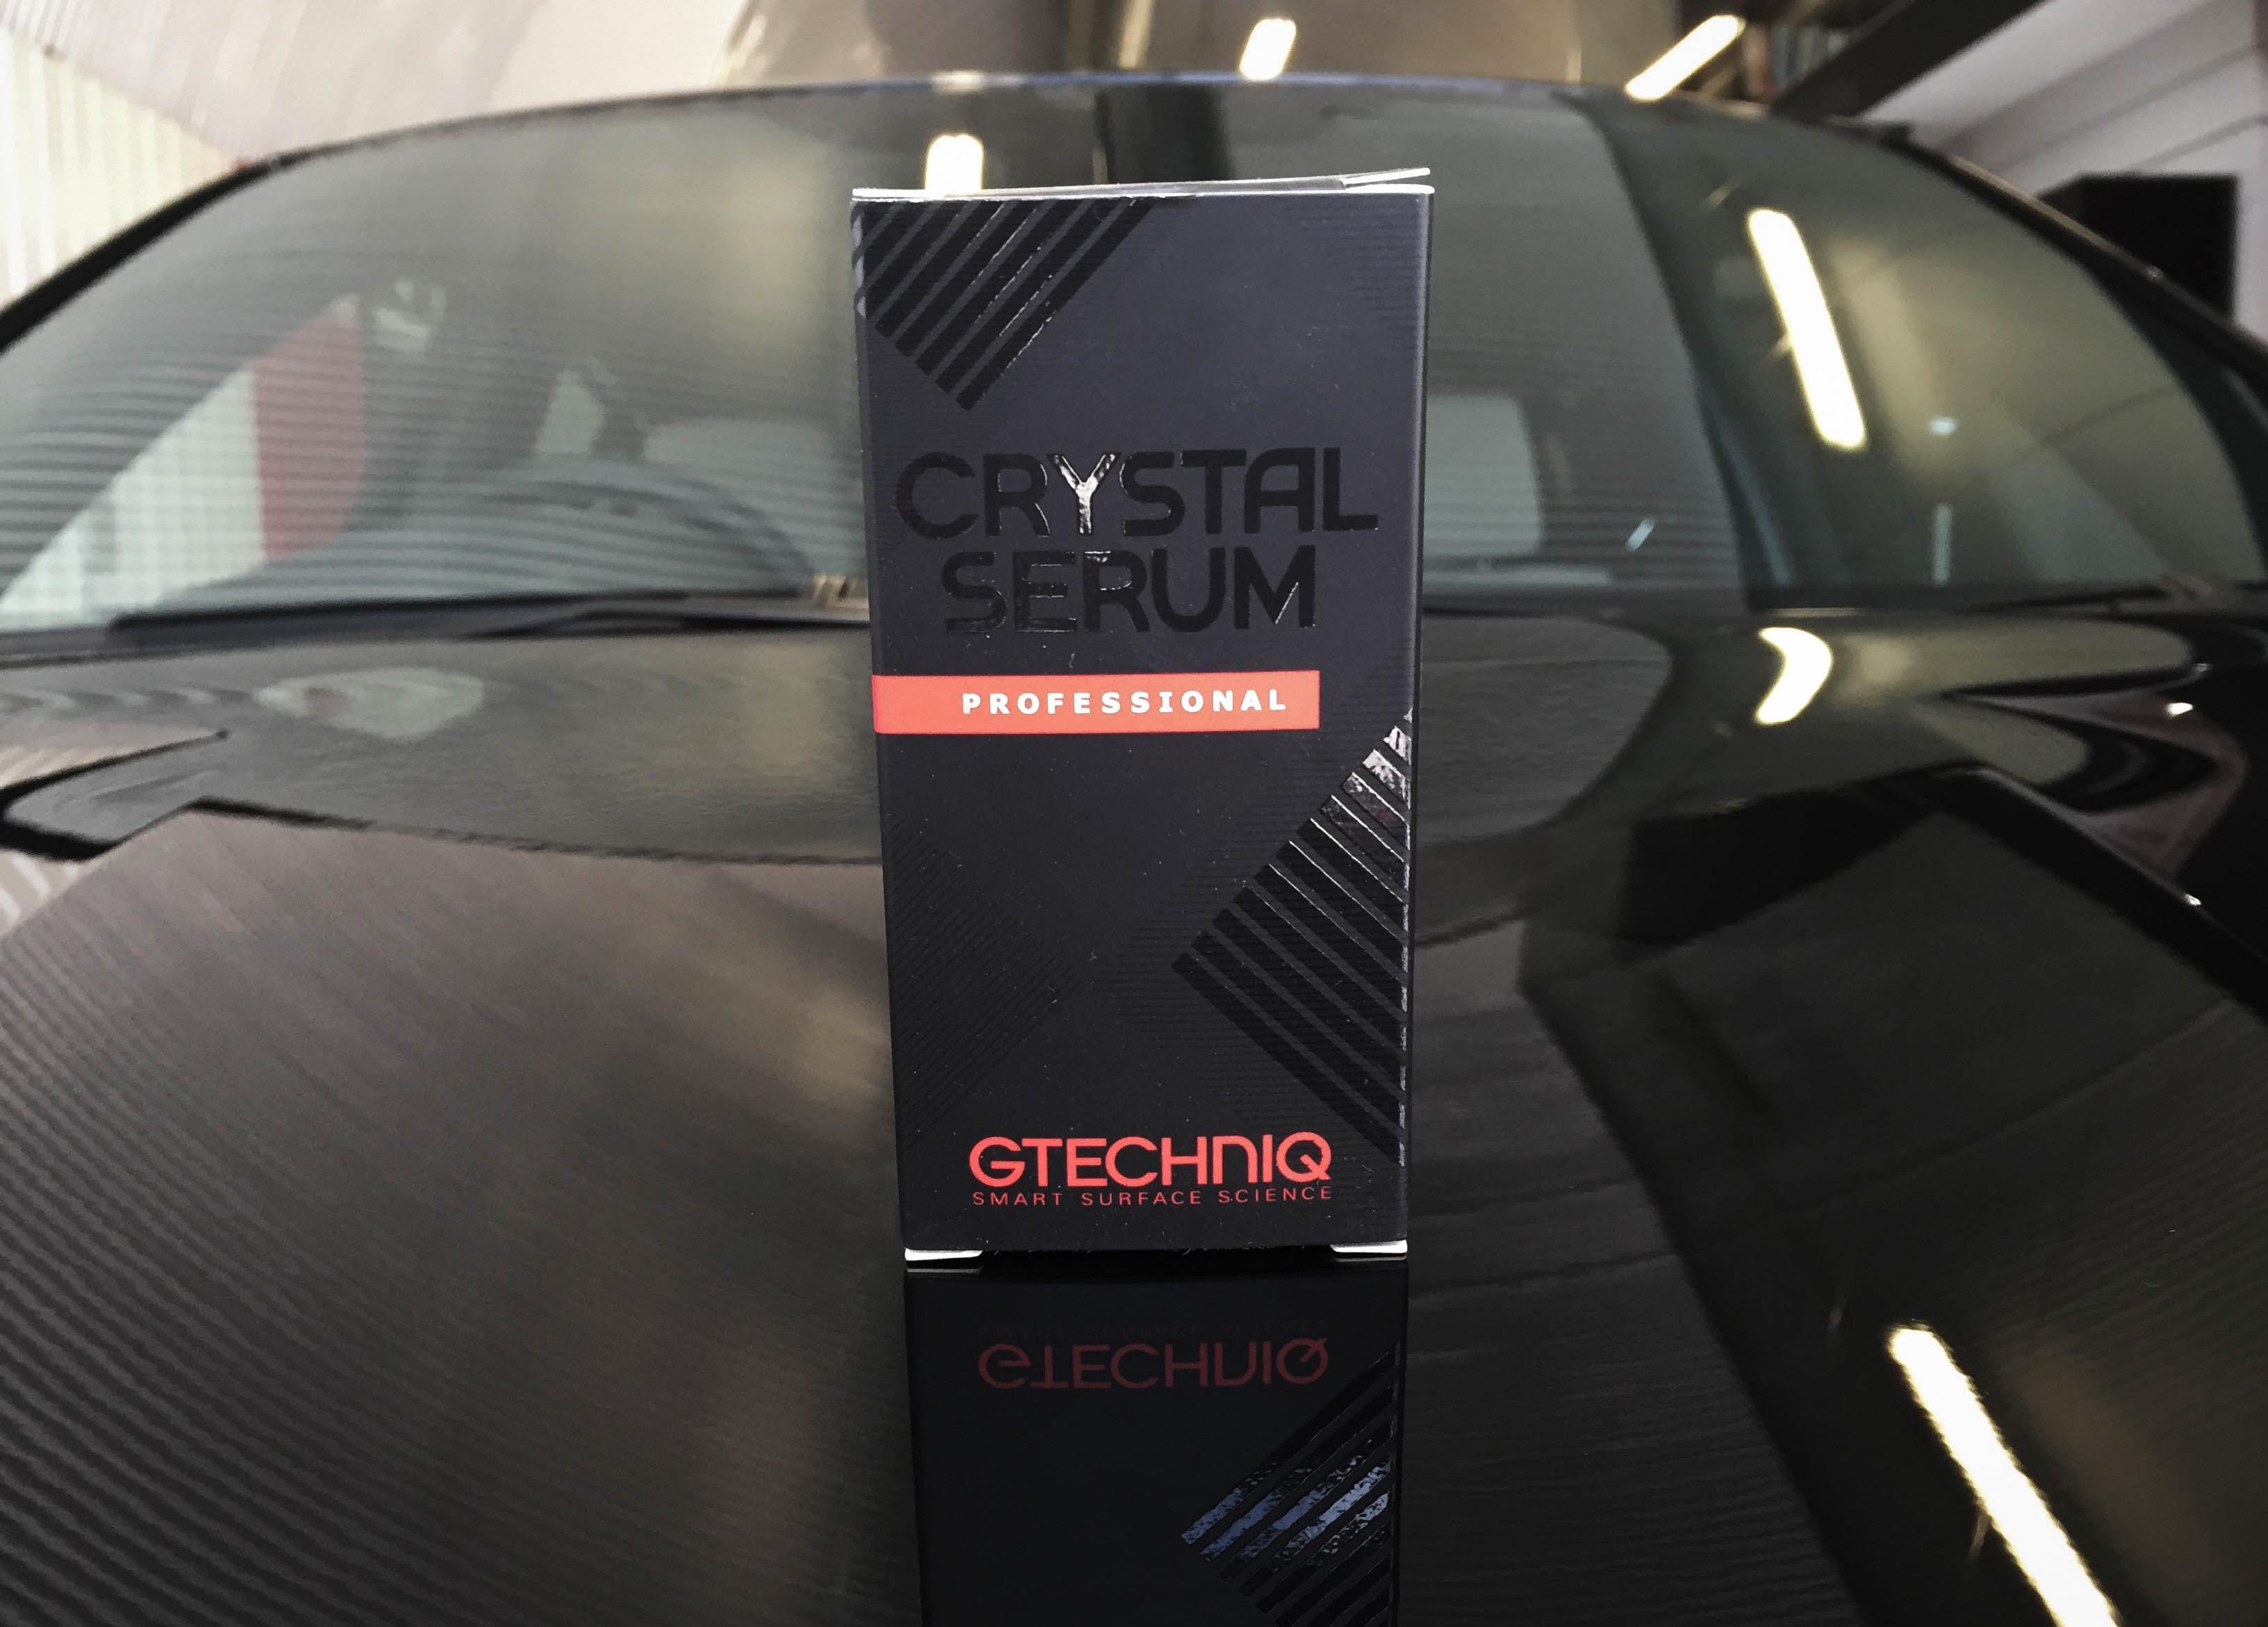 BMW X4 –Finished with GTechniq Crystal Serum